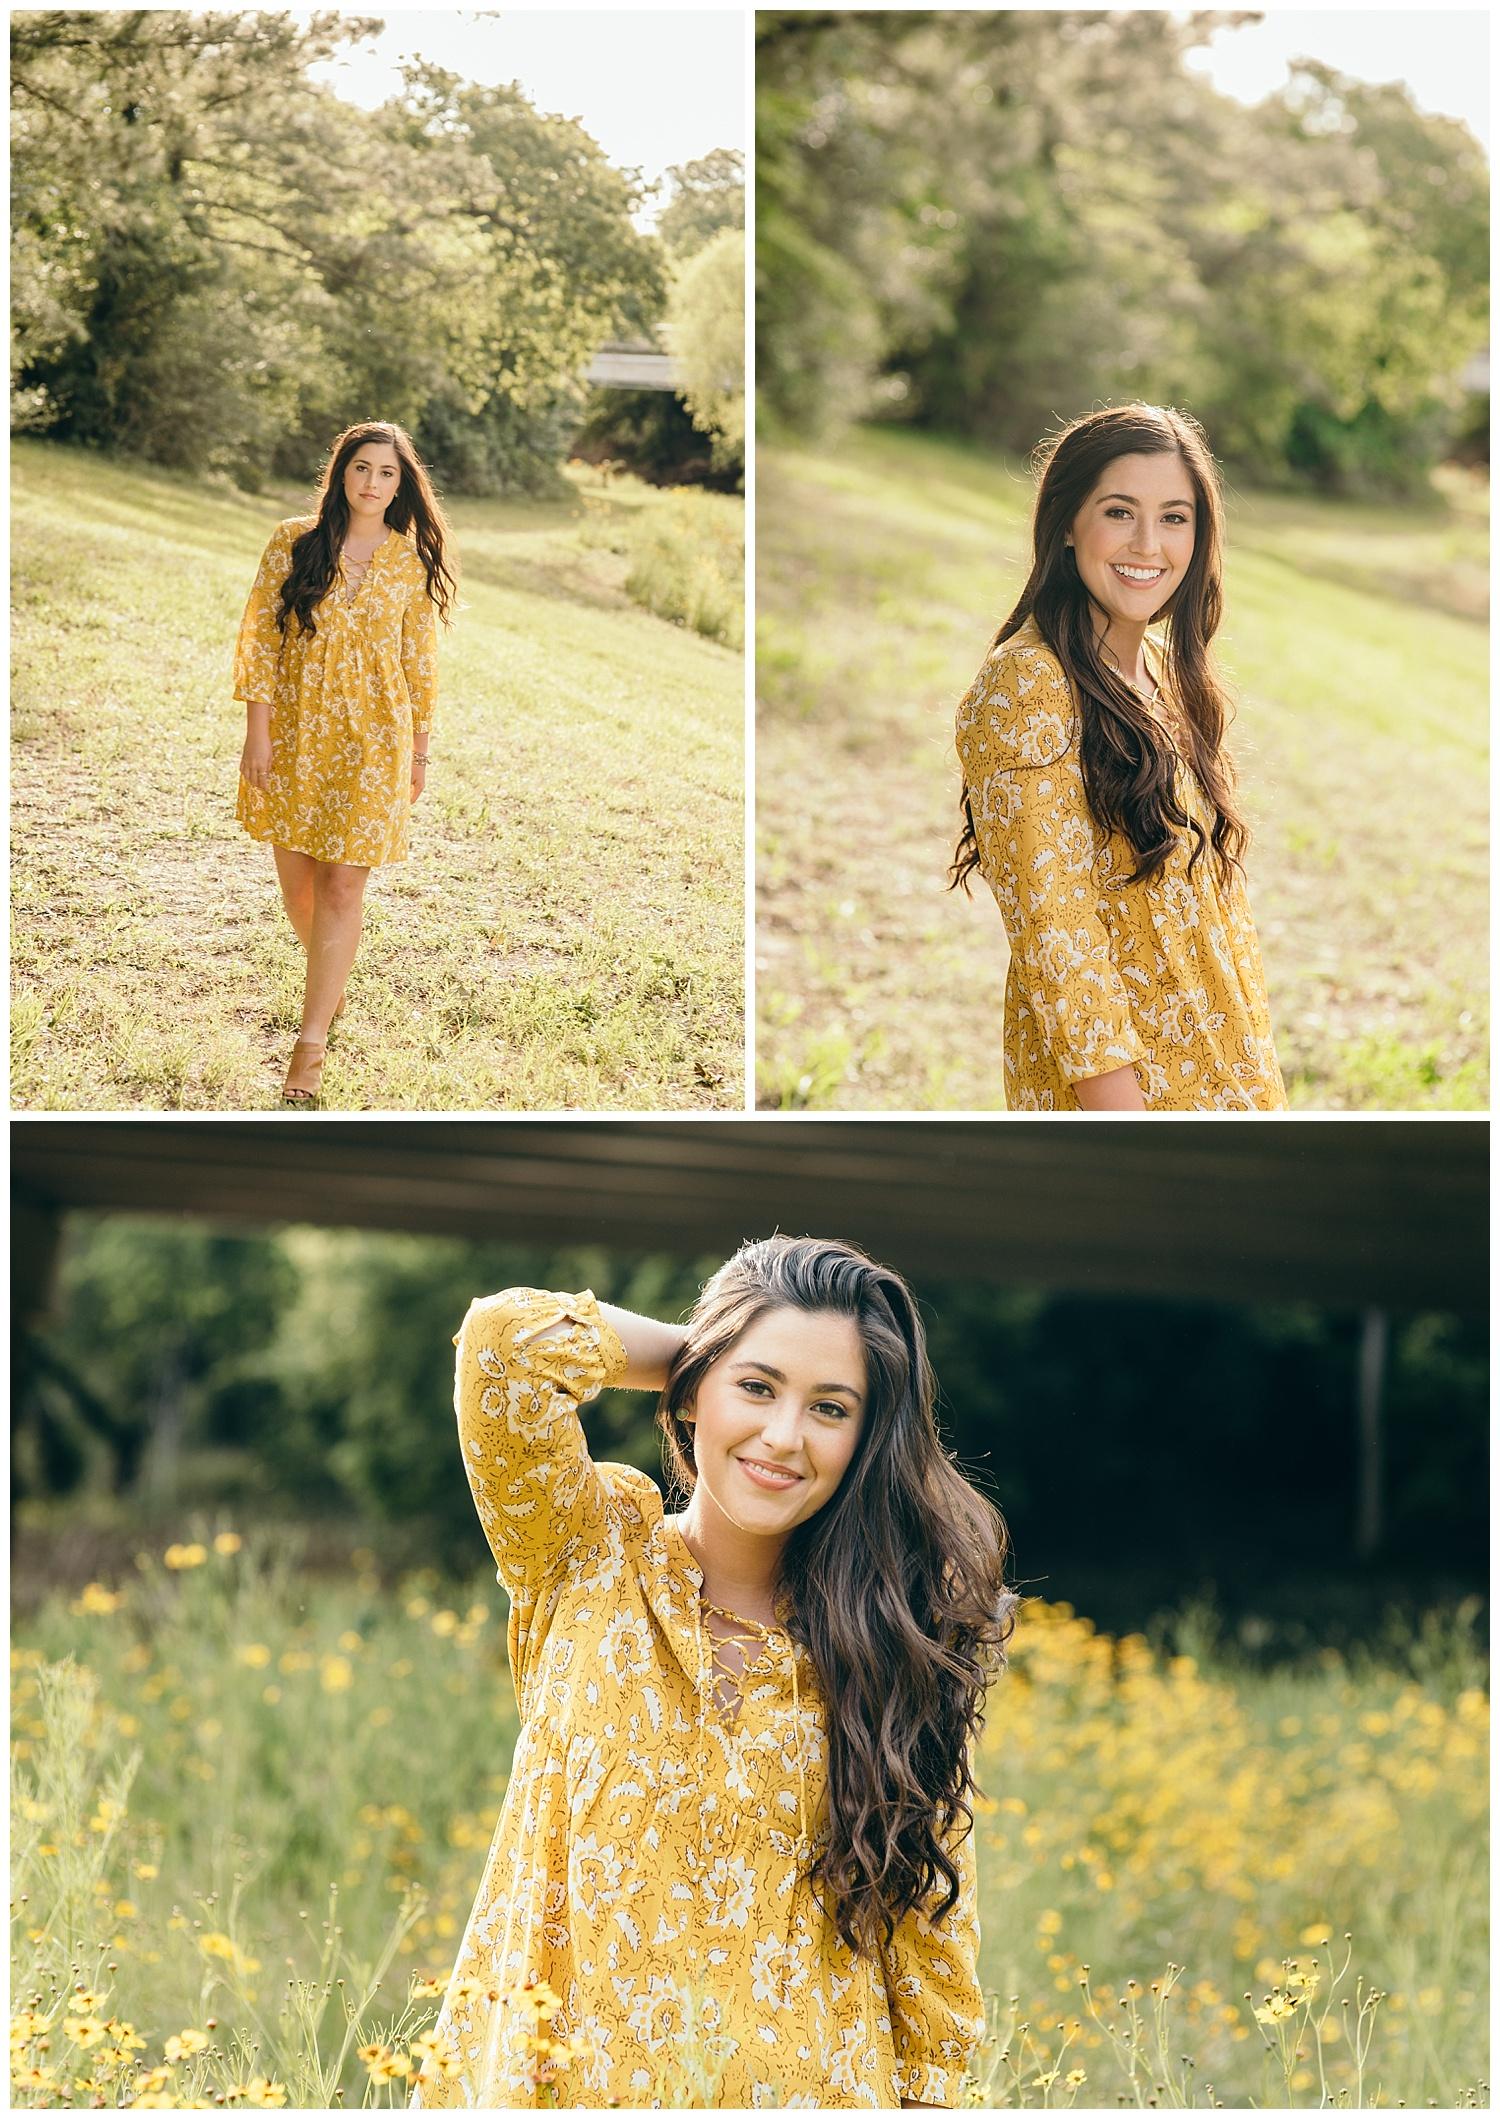 senior girl wearing yellow dress